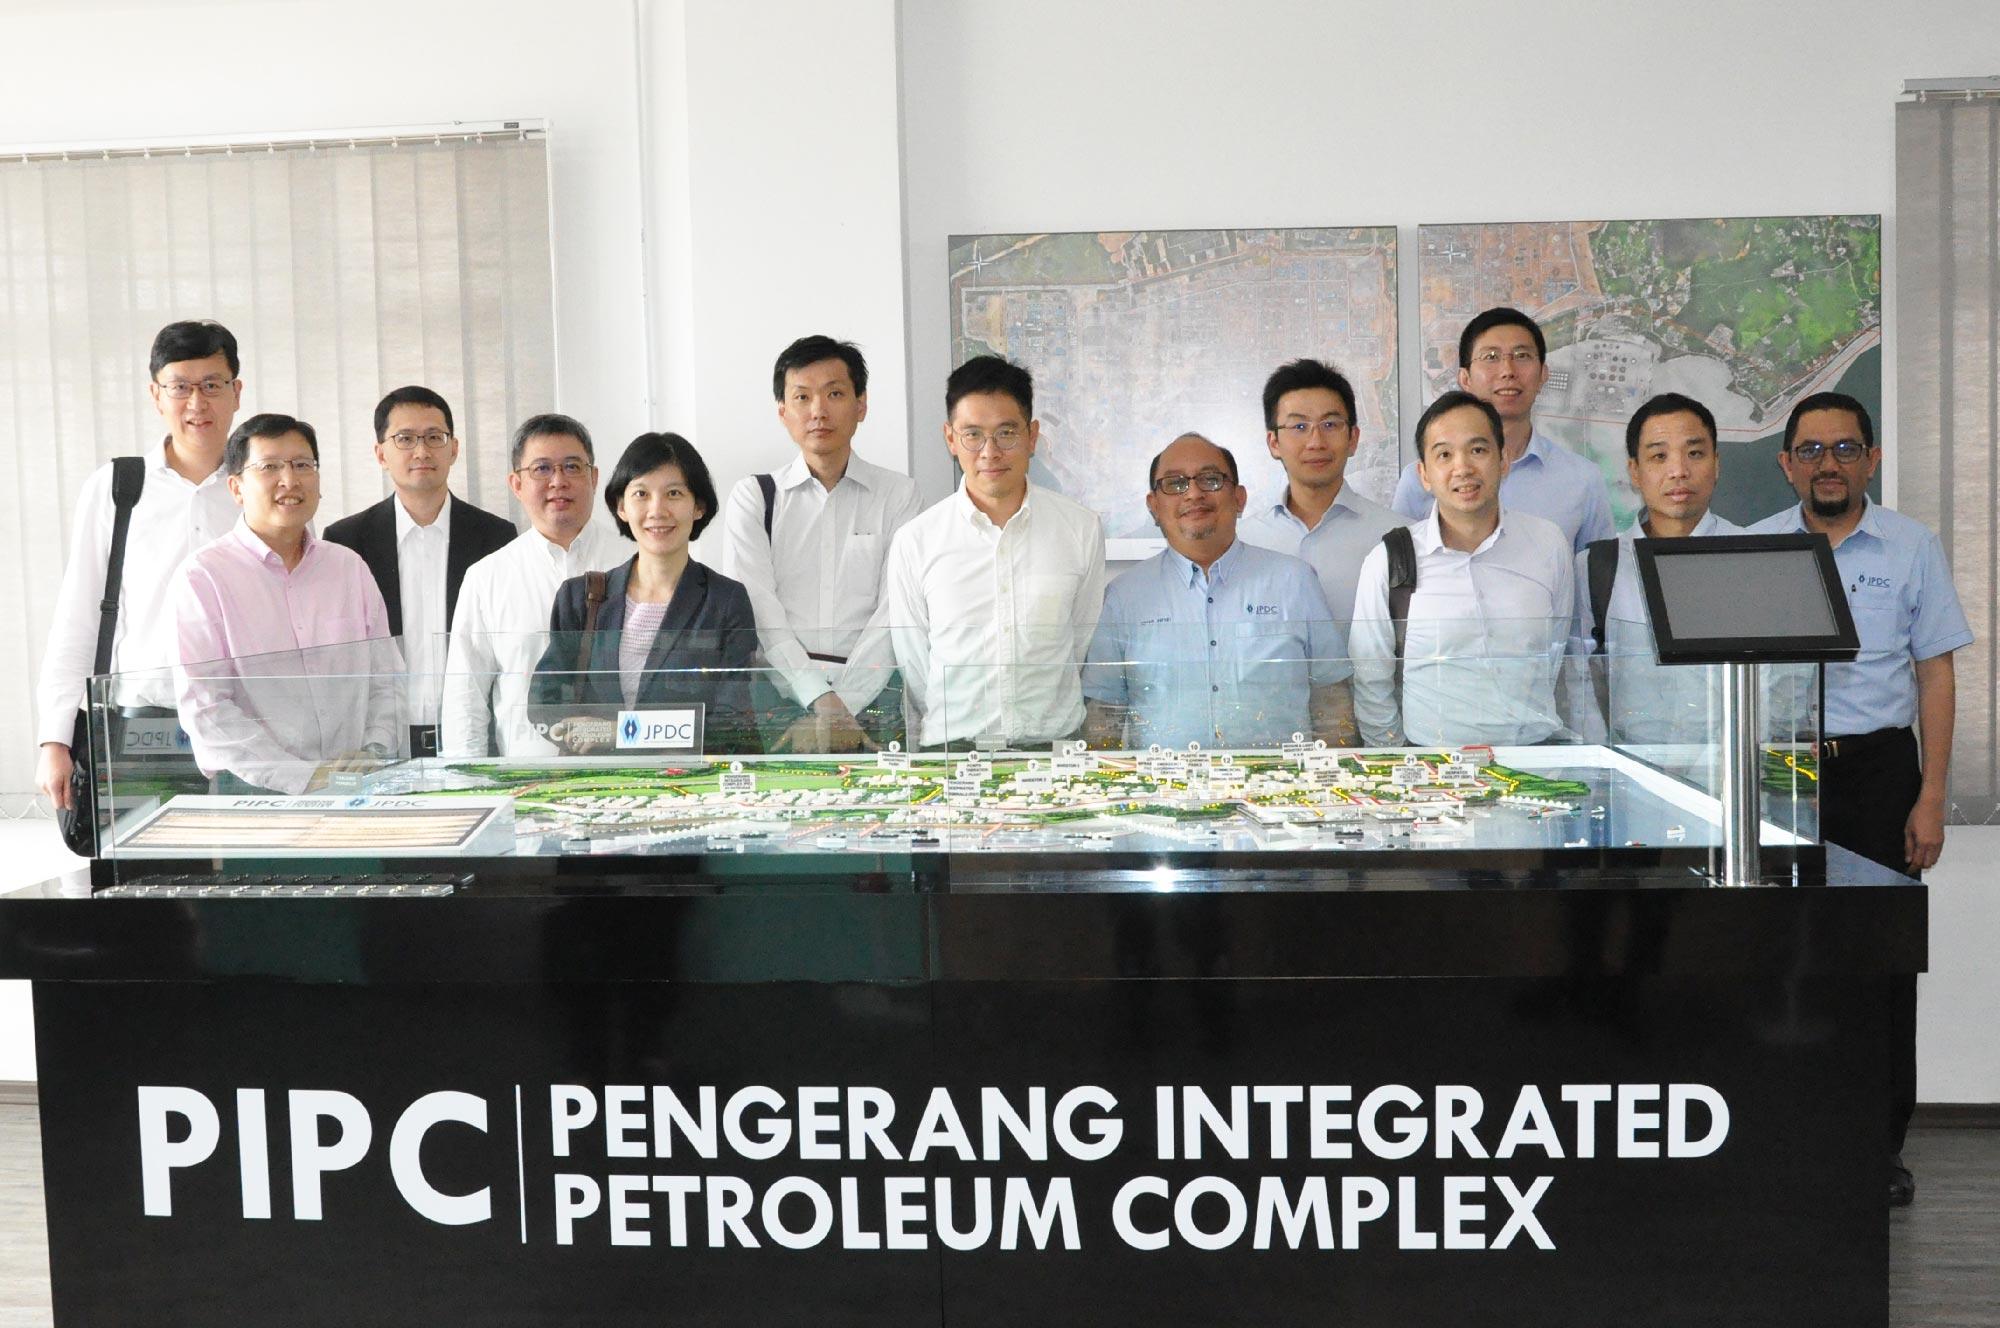 Visit by Senior Singapore Government Officials to Pengerang Integrated Petroleum Complex (PIPC)